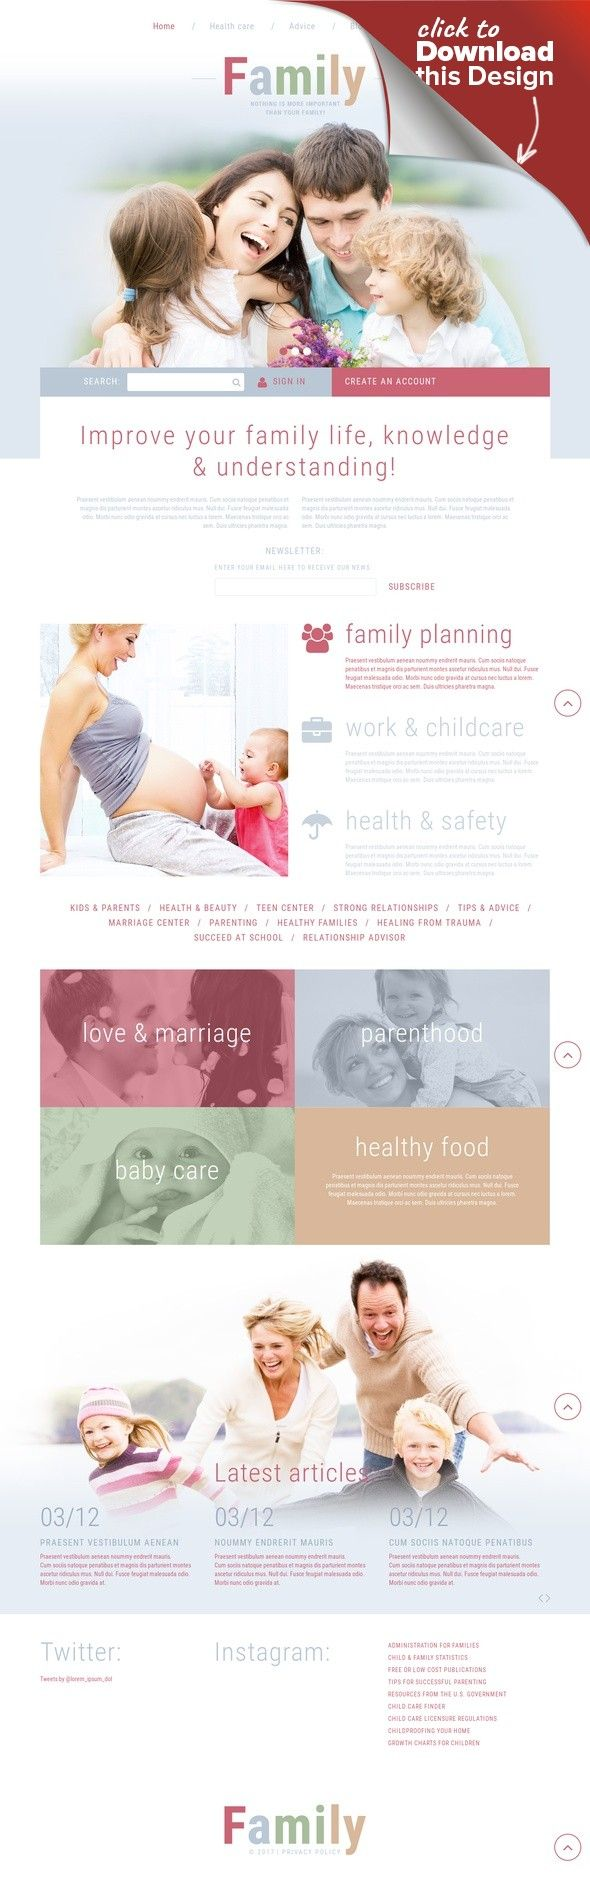 Family Joomla Template CMS & Blog Templates, Joomla Templates, Home & Family, Family Templates